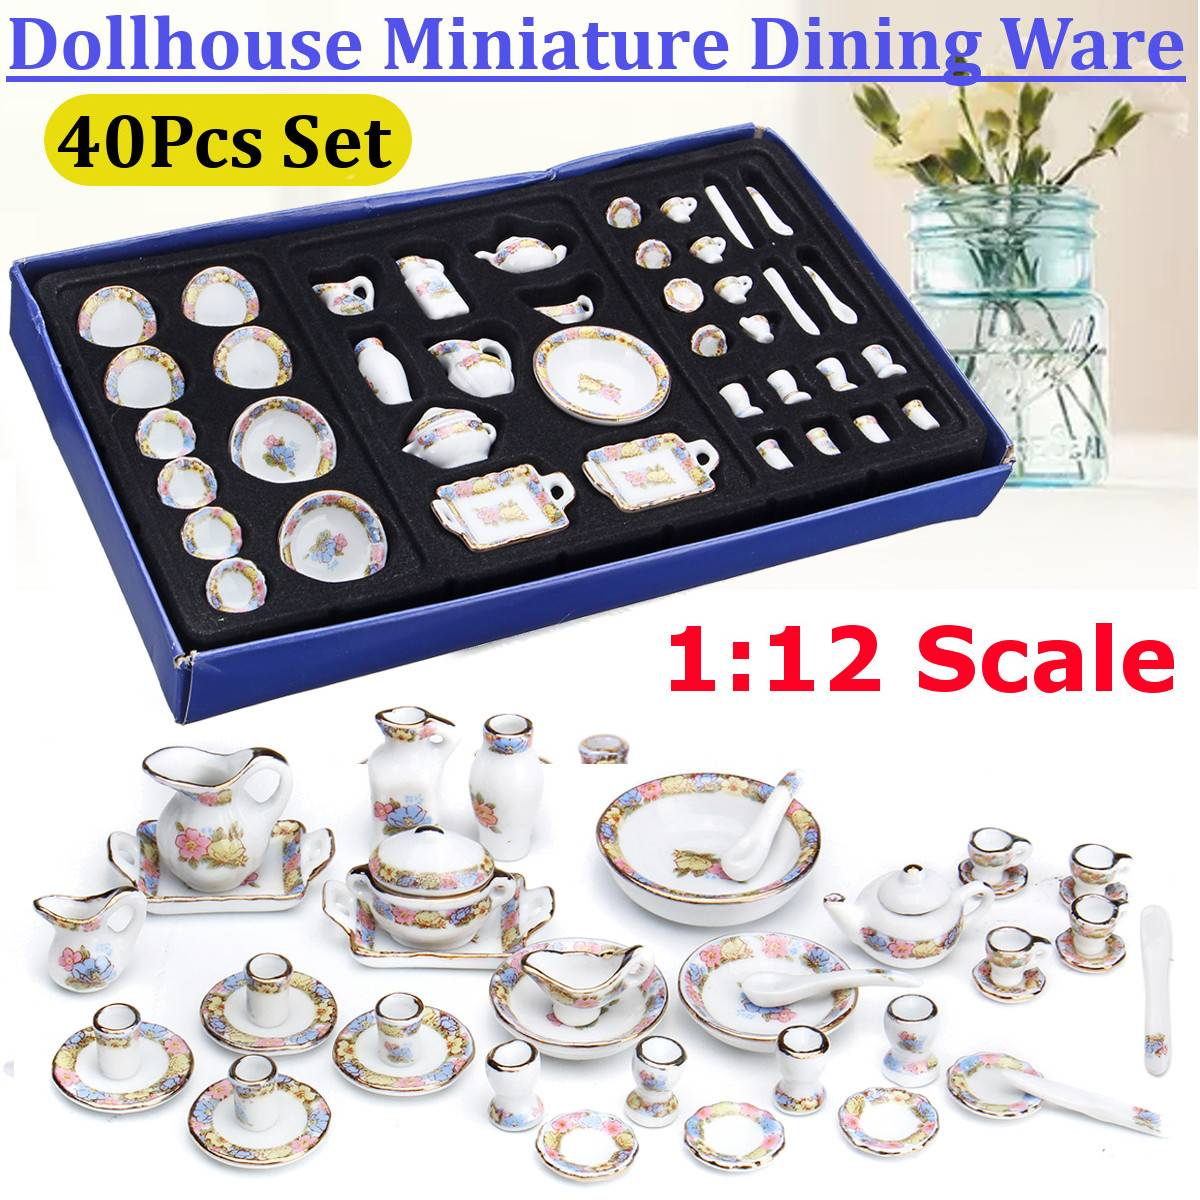 1:12 Scale Miniature Dollhouse China Ceramic Vase Set For Doll House Porcelain